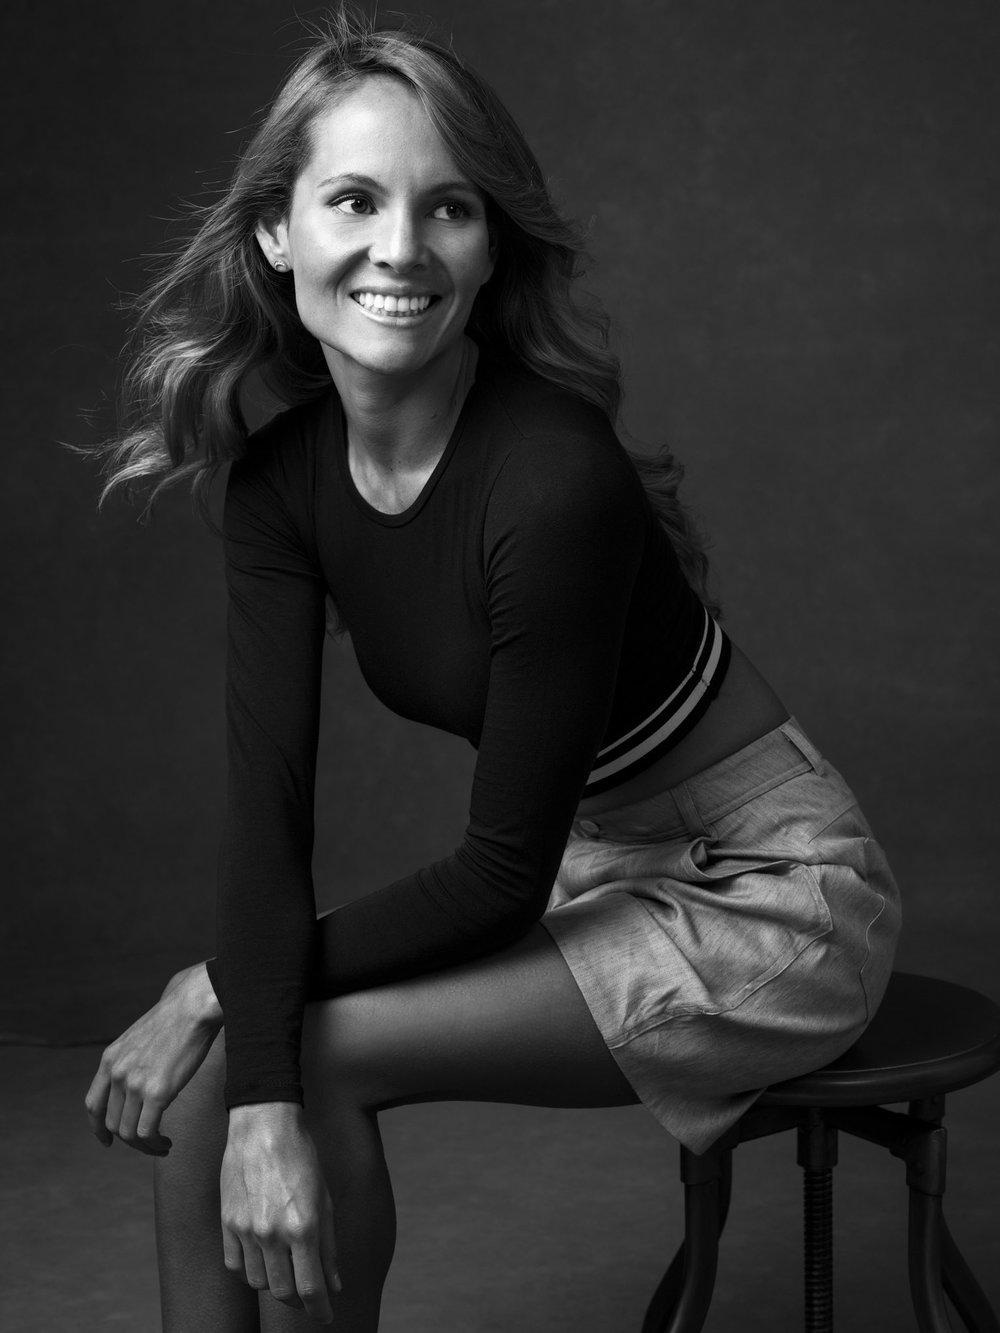 Rita Murga - Surfer / Swimwear Designer